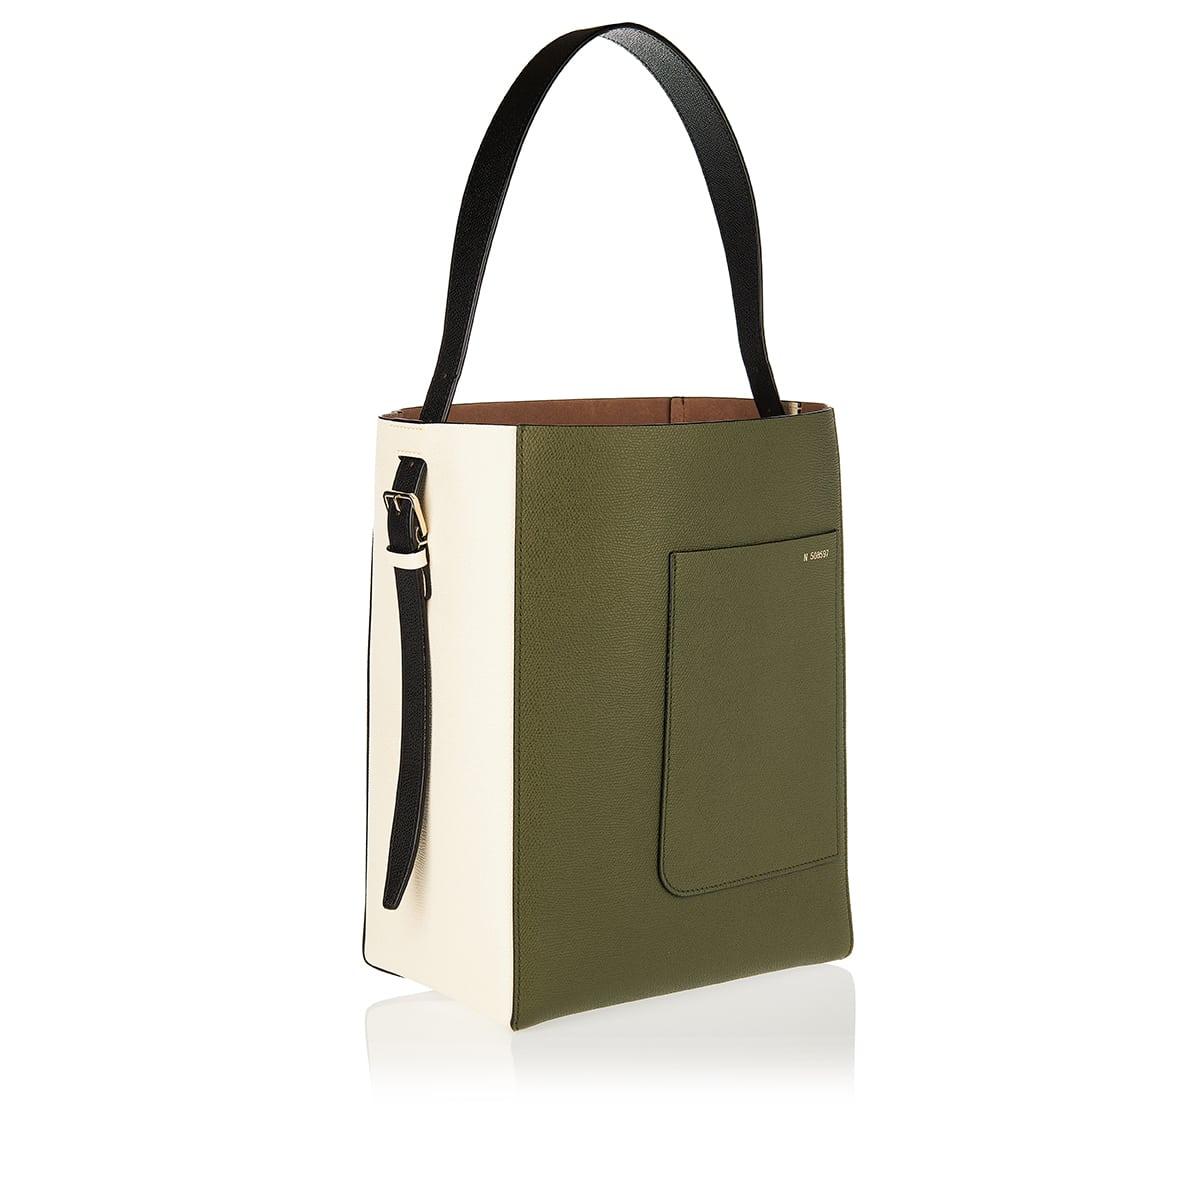 Bucket medium two-tone leather bag